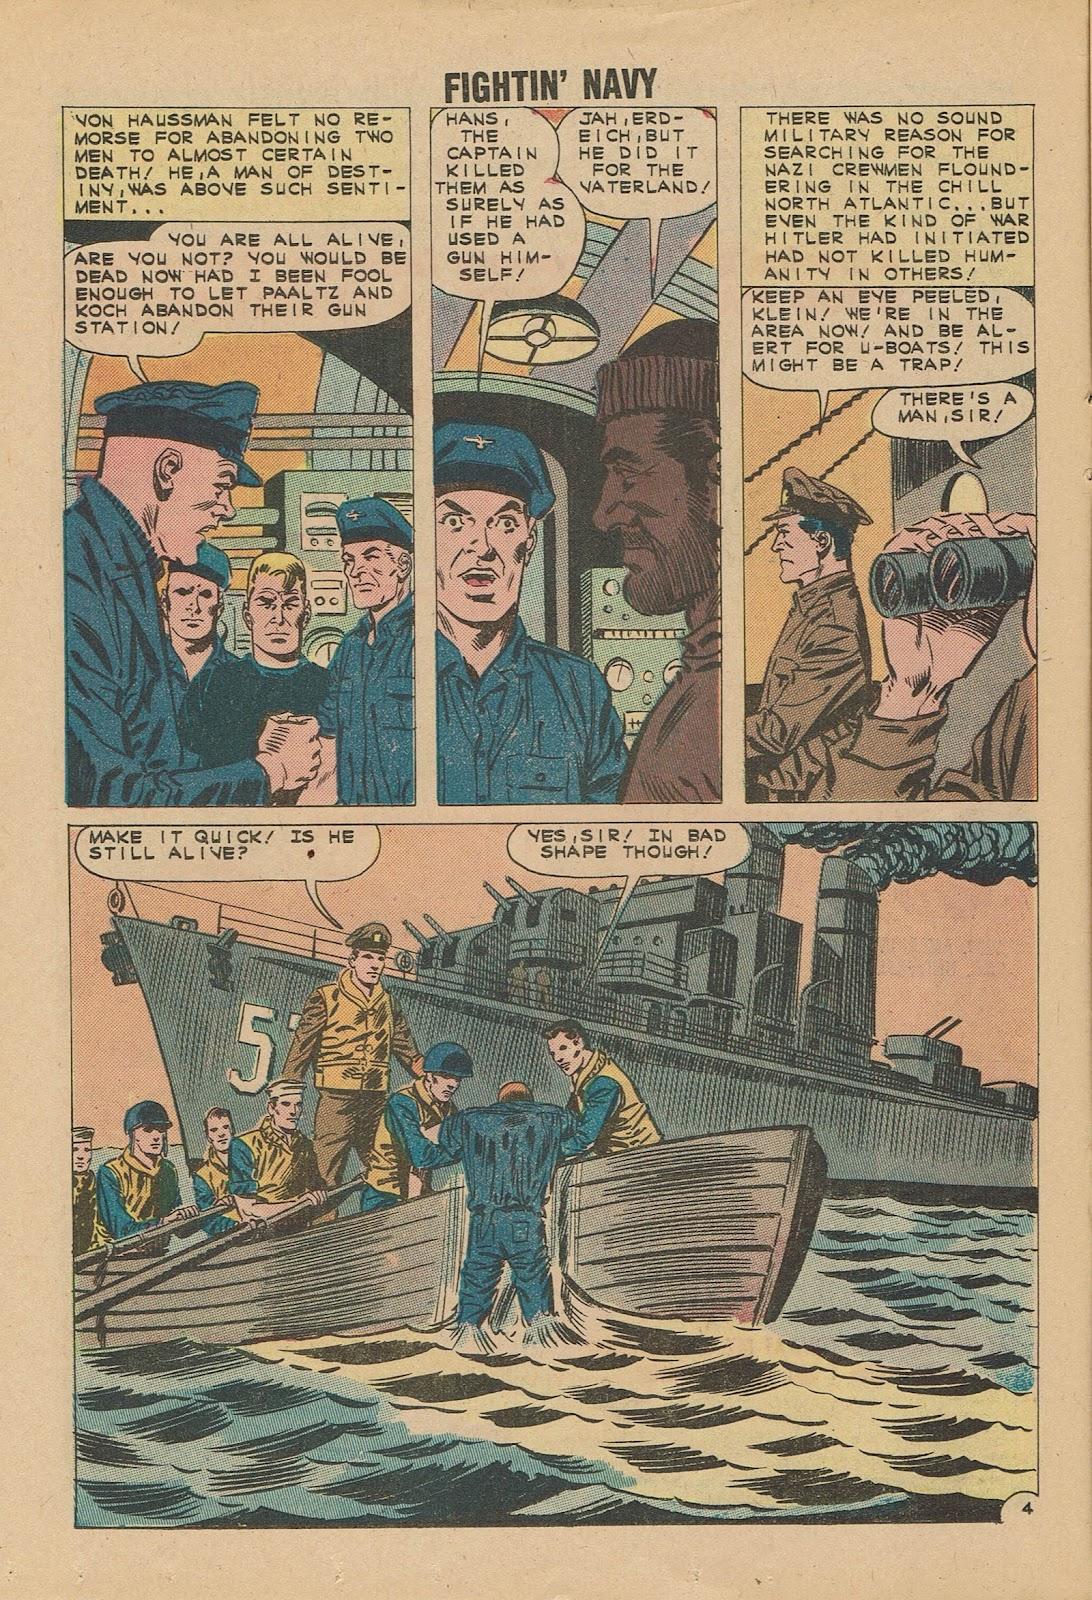 Read online Fightin' Navy comic -  Issue #101 - 16